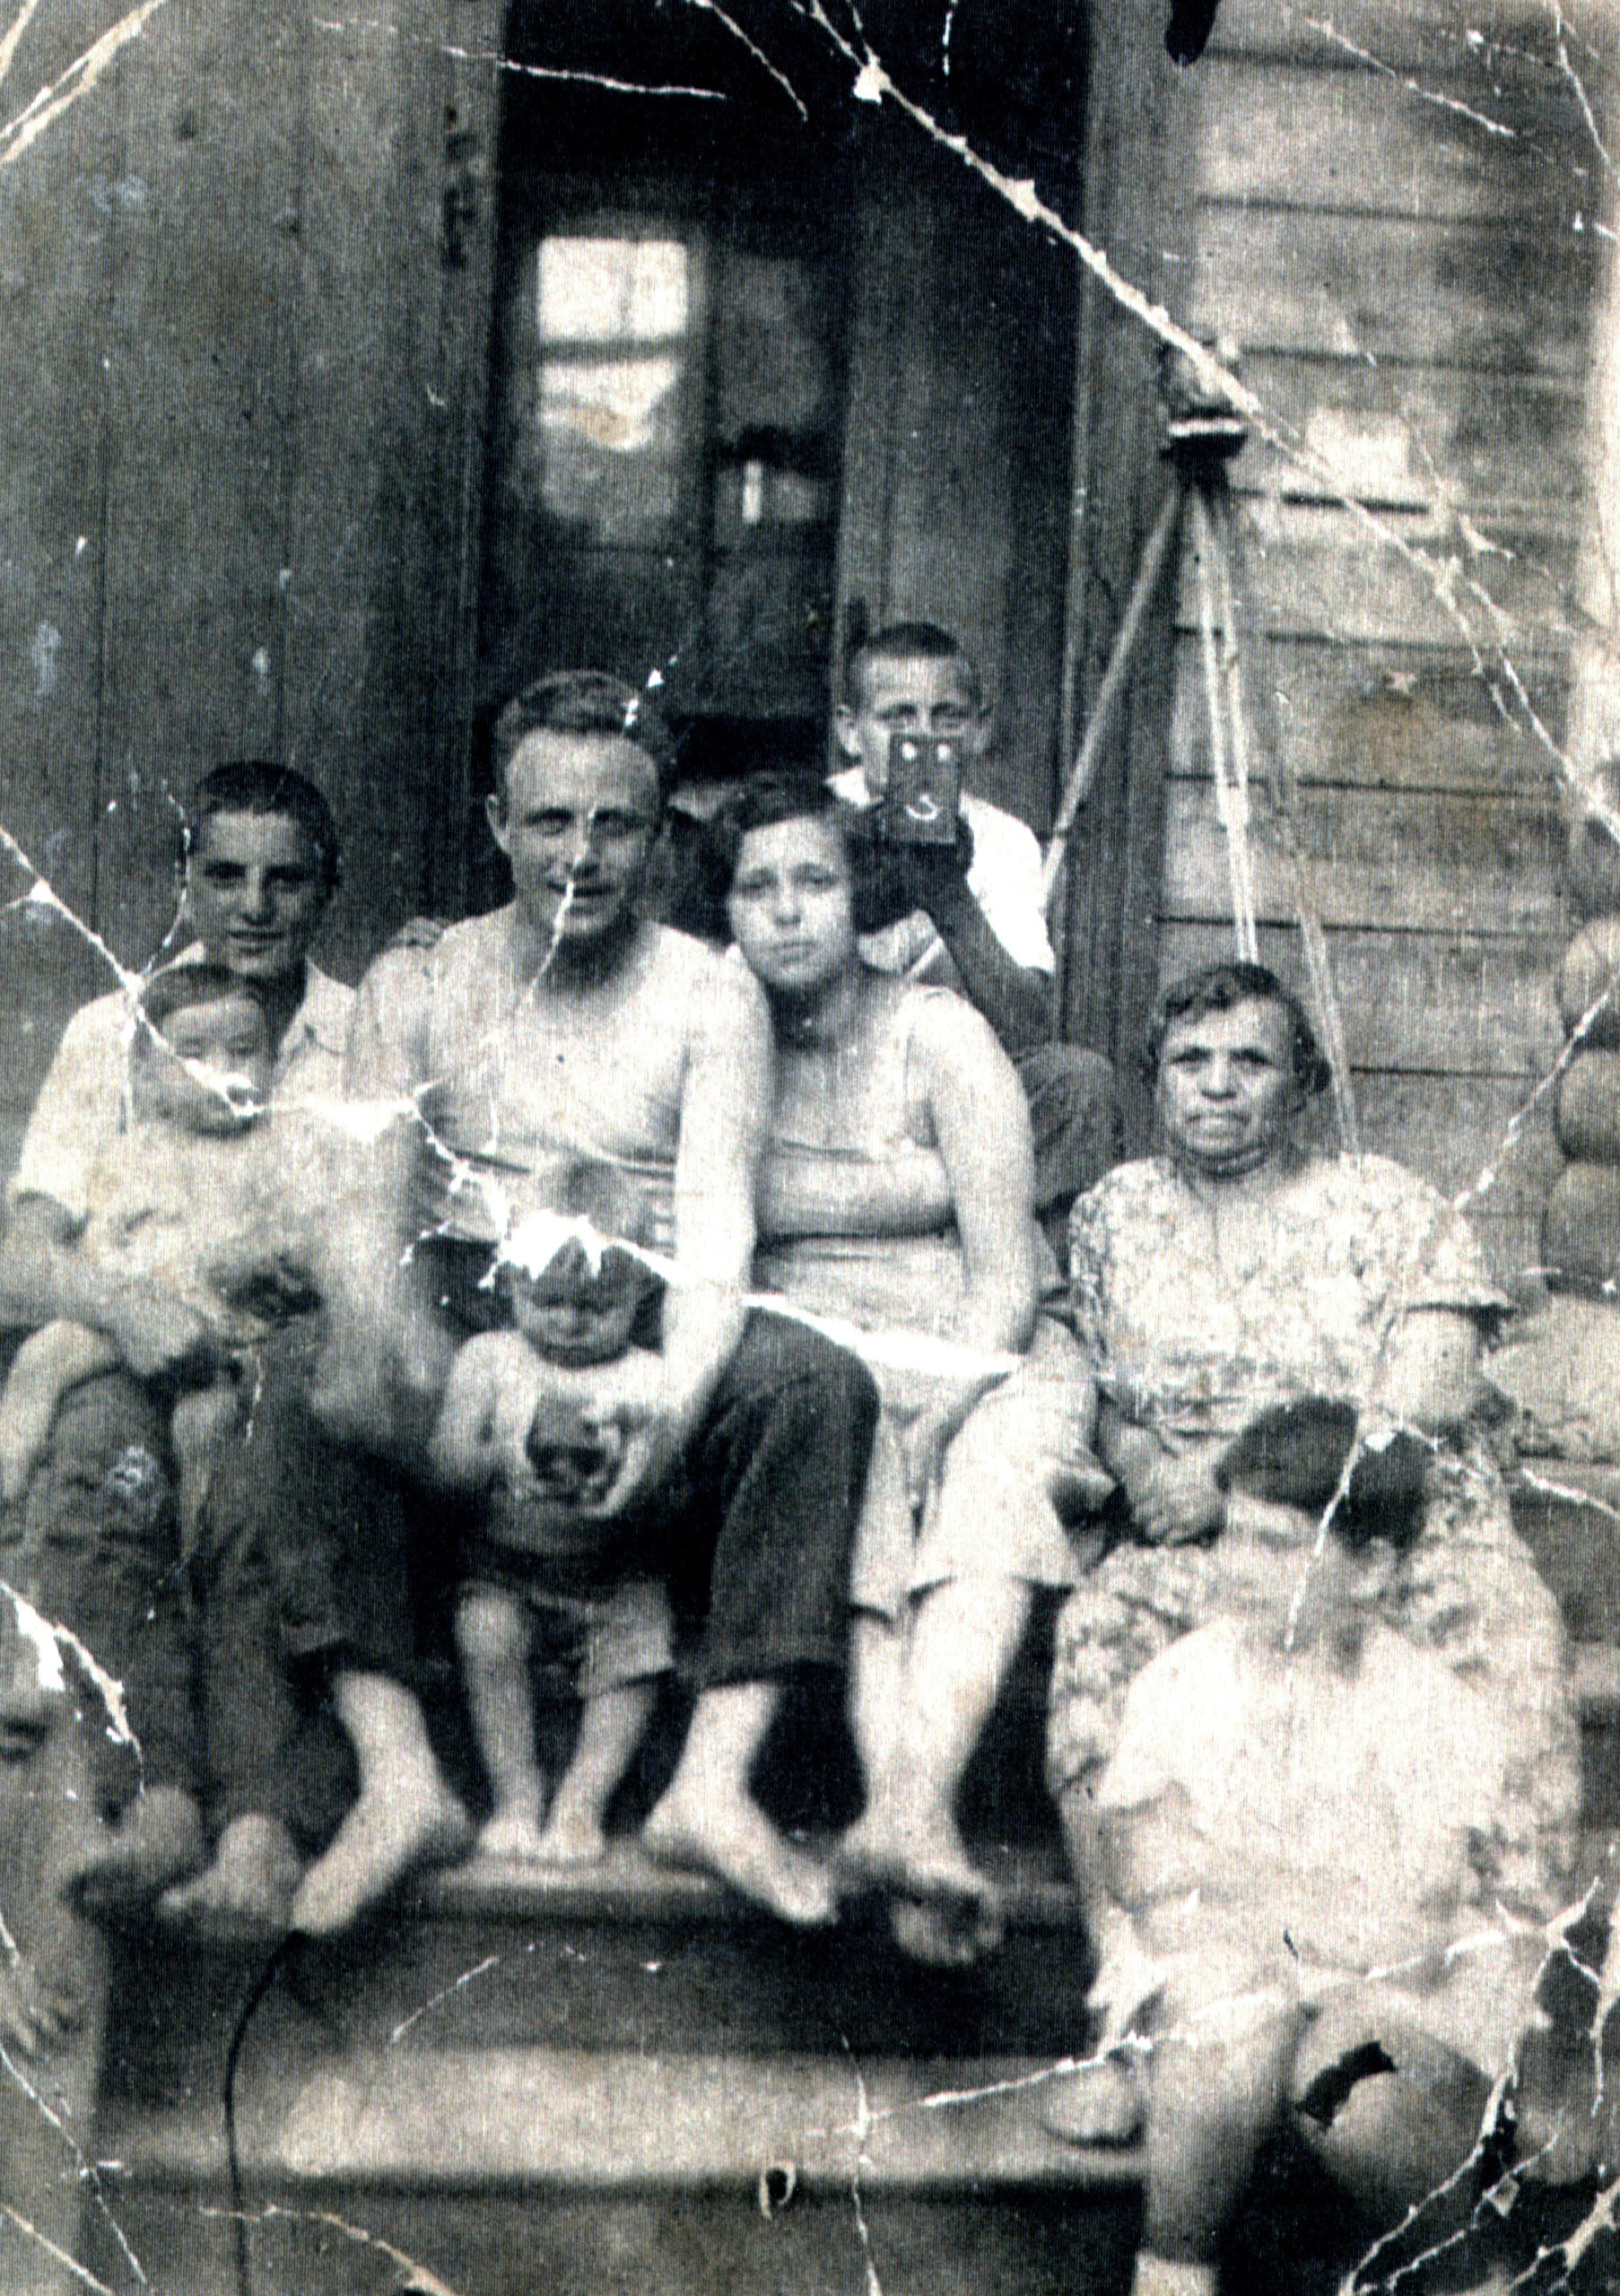 Efim Pisarenko, his brother Misha Pisarenko and their neighbors